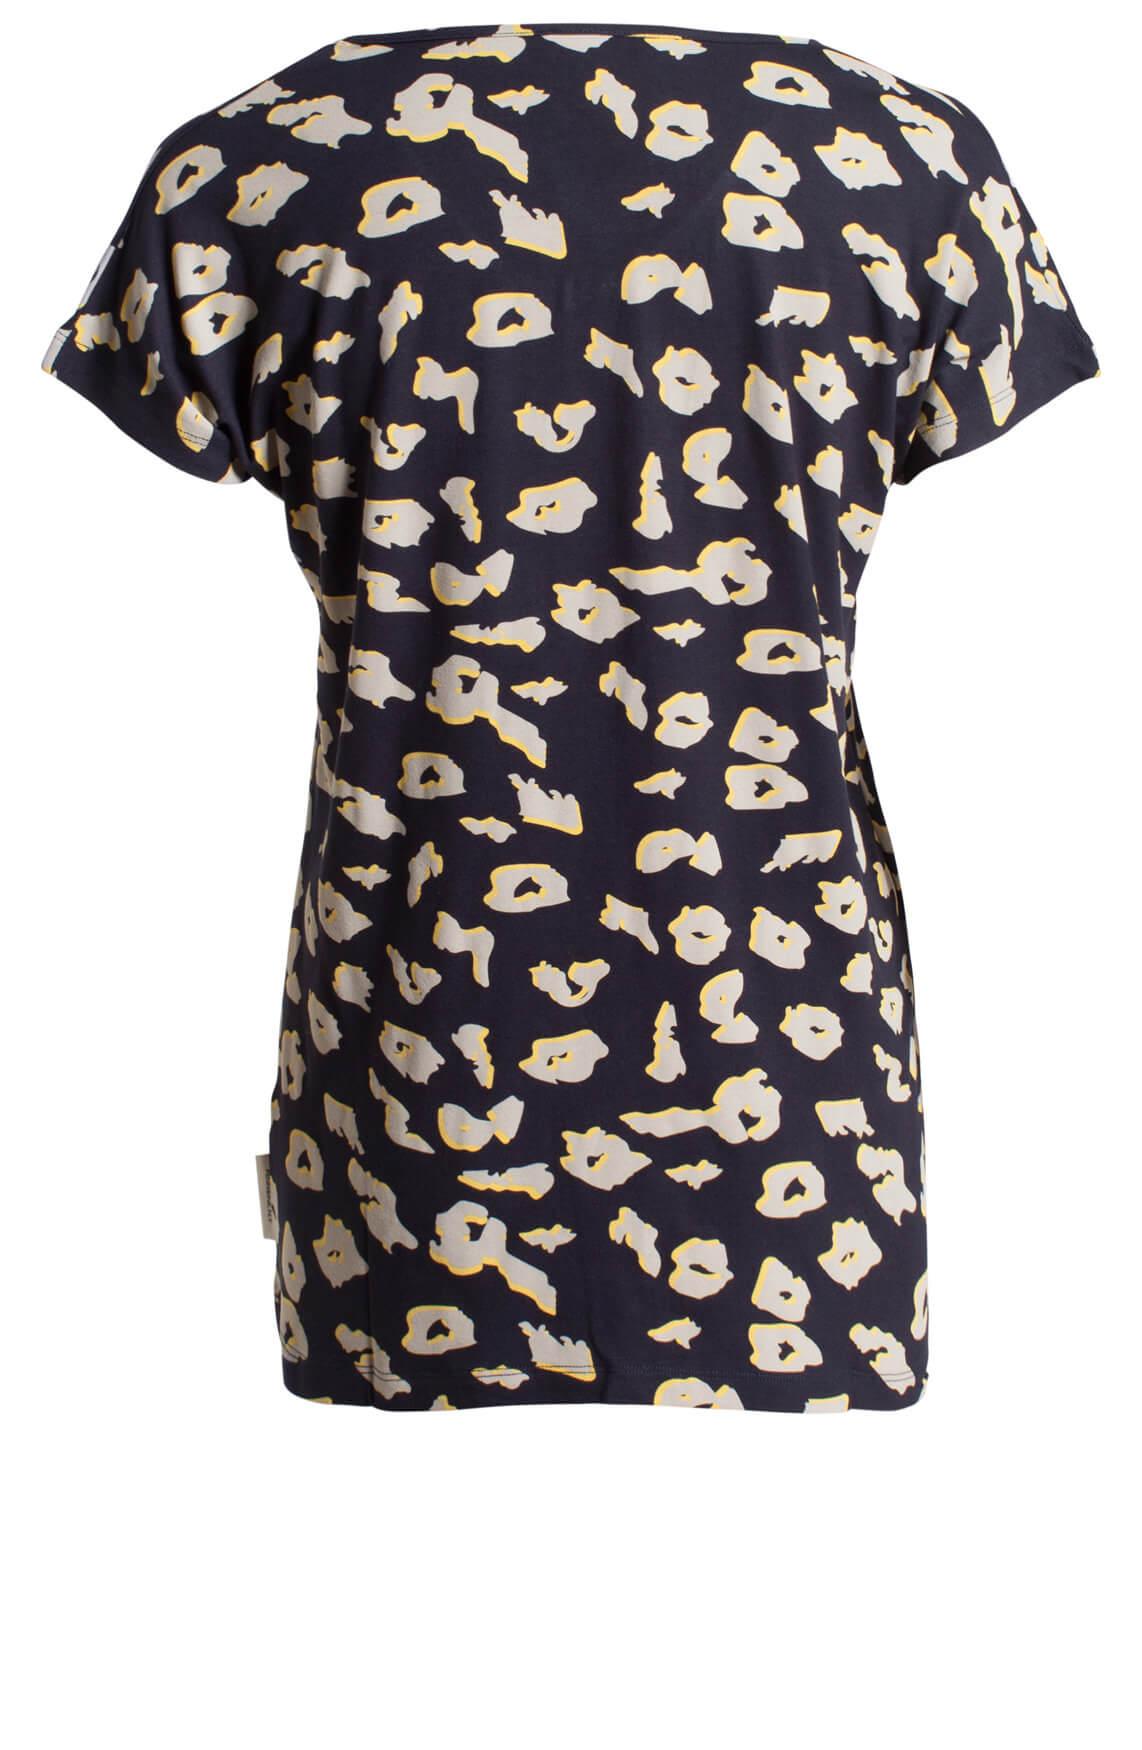 Penn & Ink Dames Shirt met print Blauw | Anna van Toor - photo#8